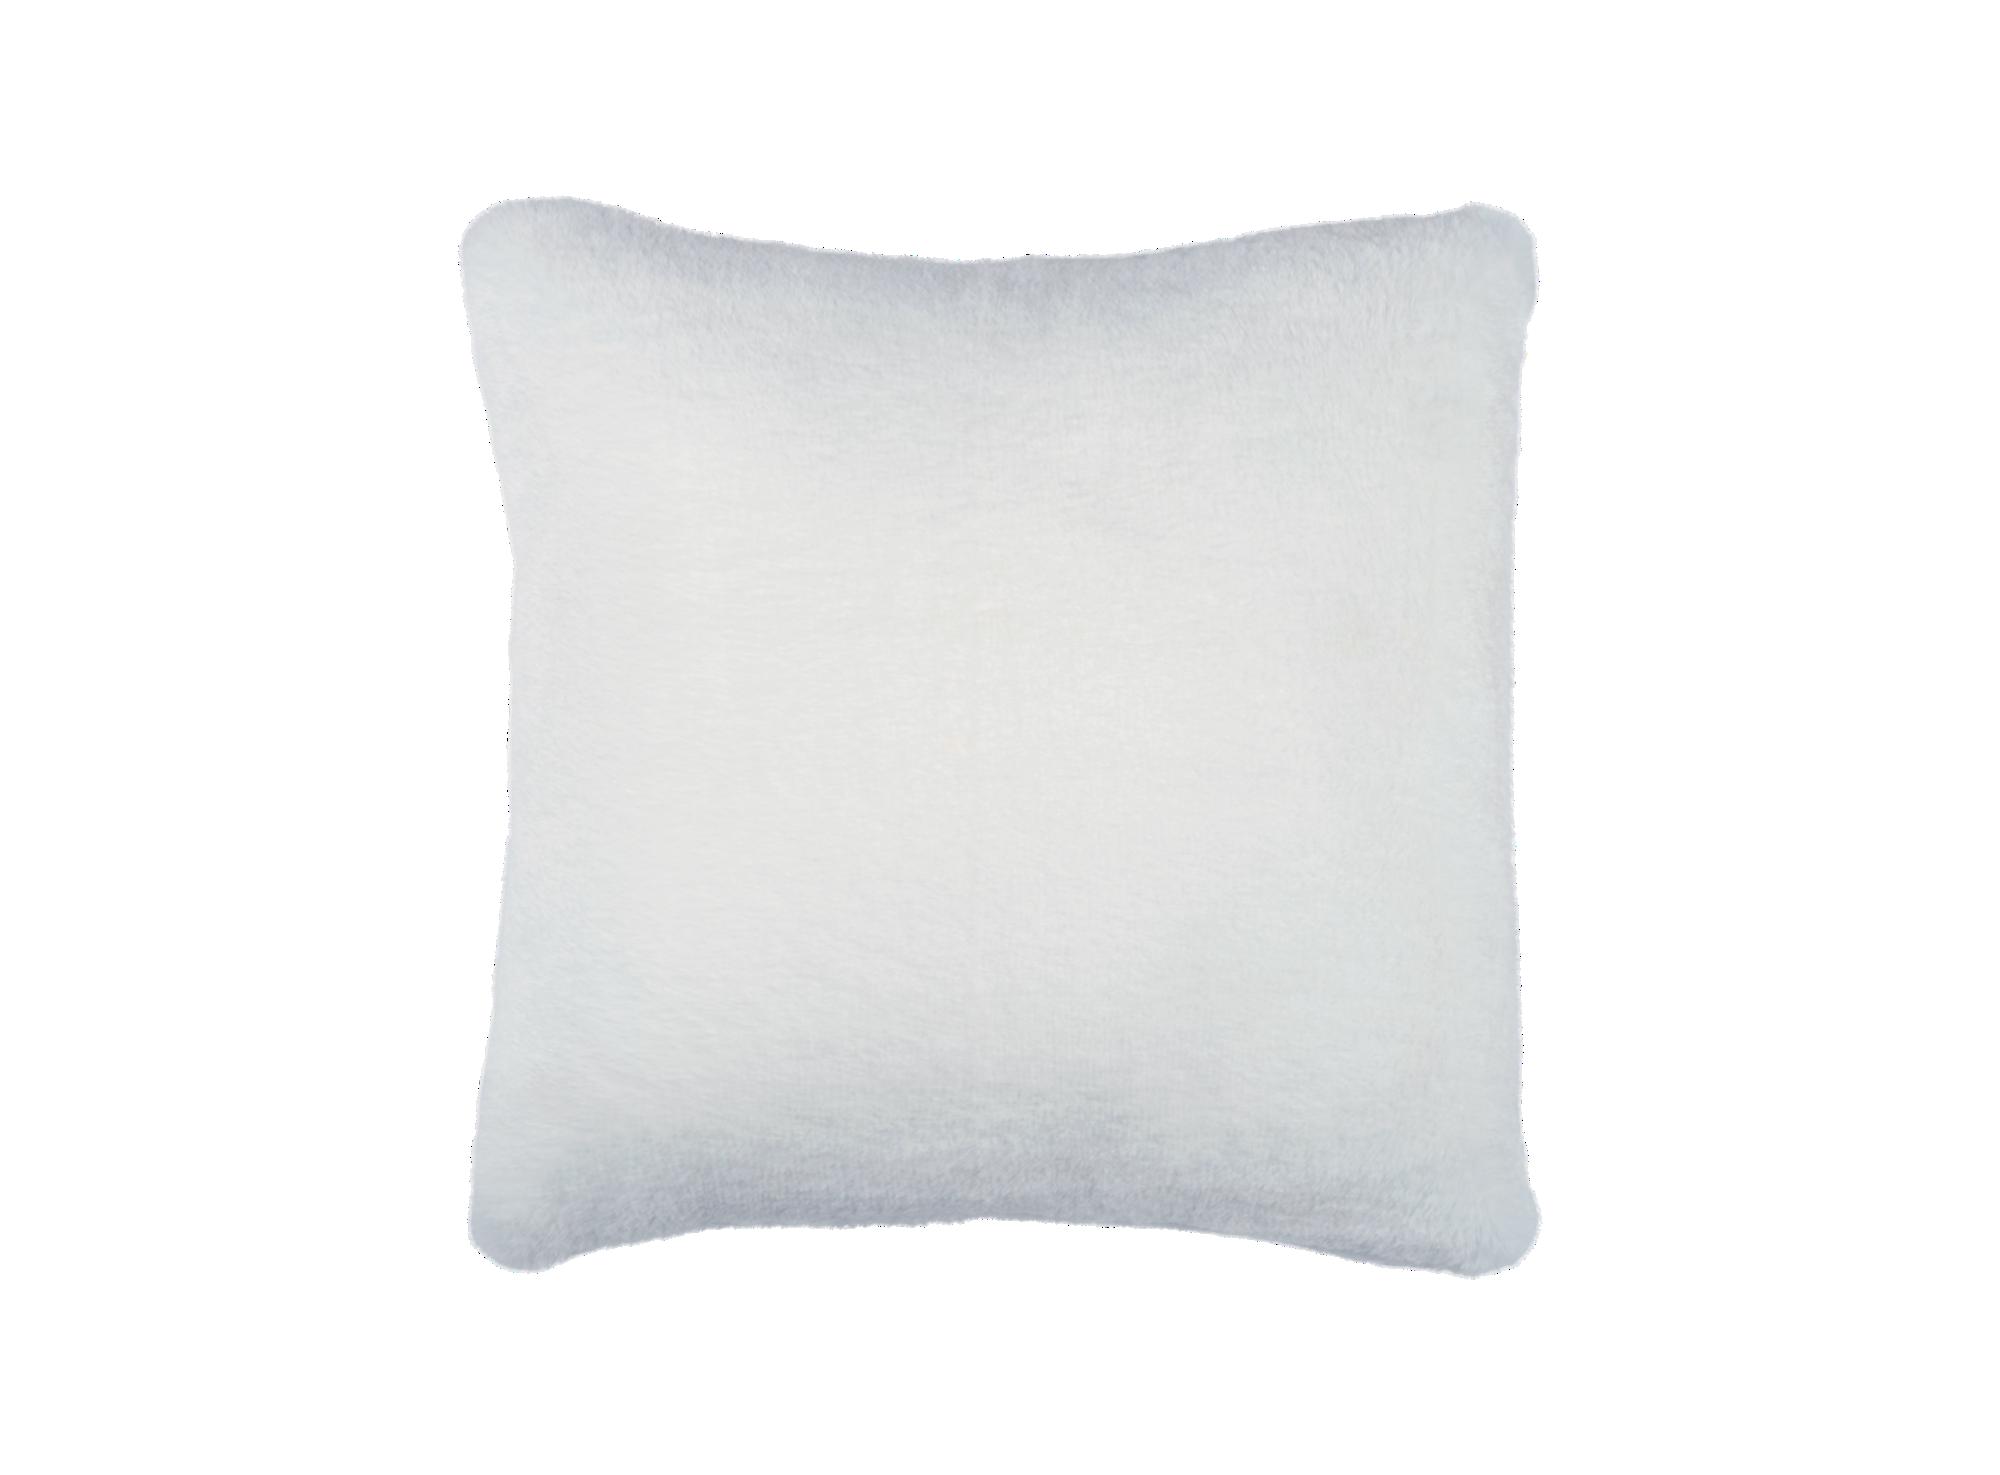 Coussin 40x40 housse 100% polyester coussin revetu 100% polypropylene ...